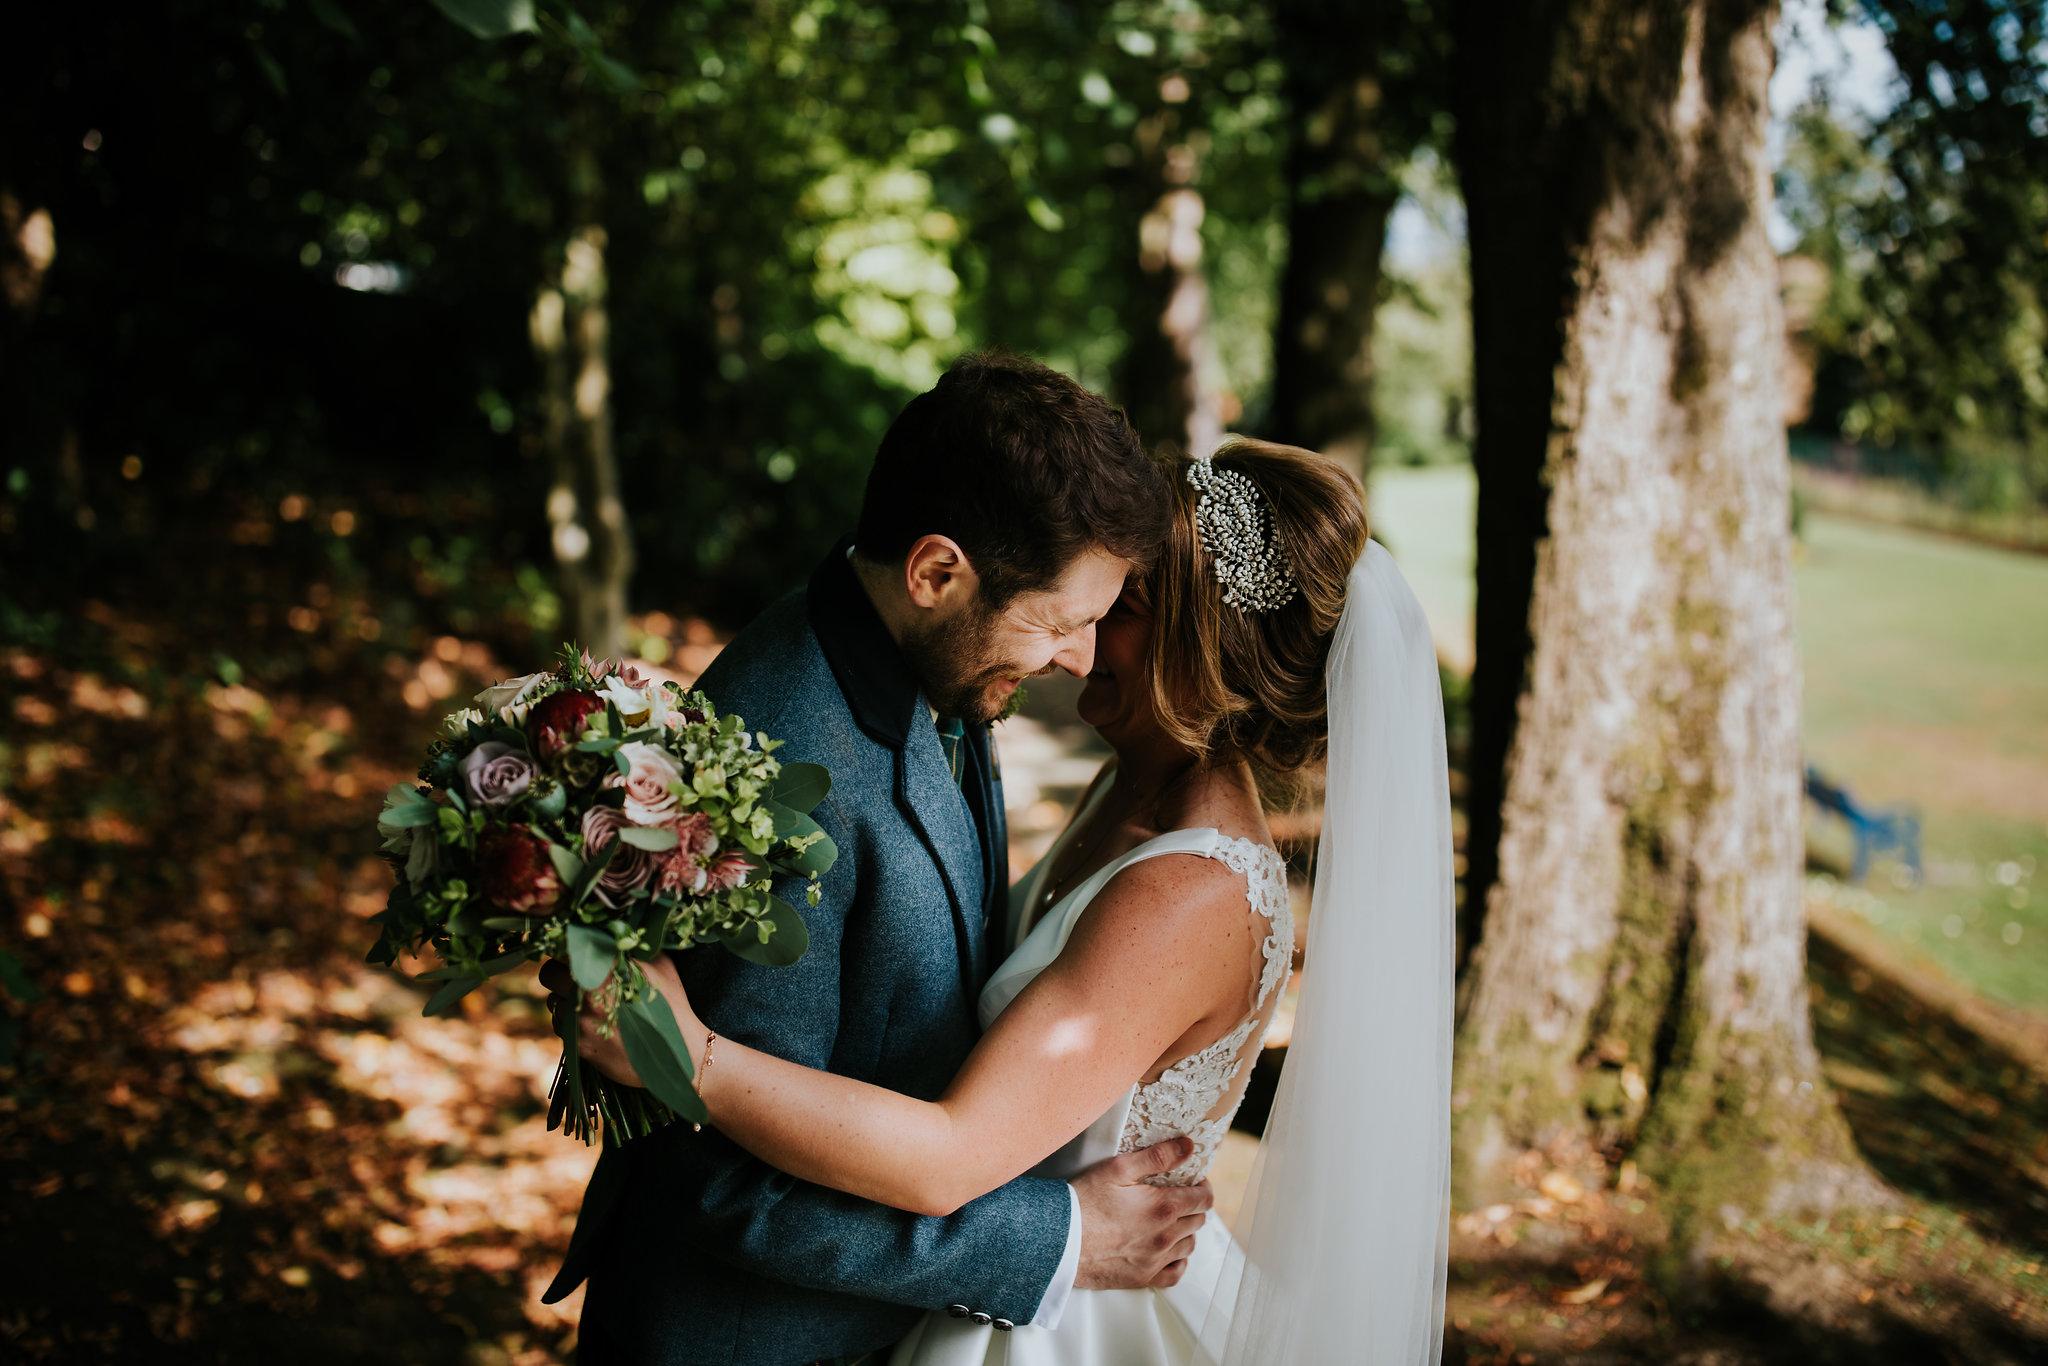 Cottiers wedding lavender and rose wedding florists scotland16.jpg